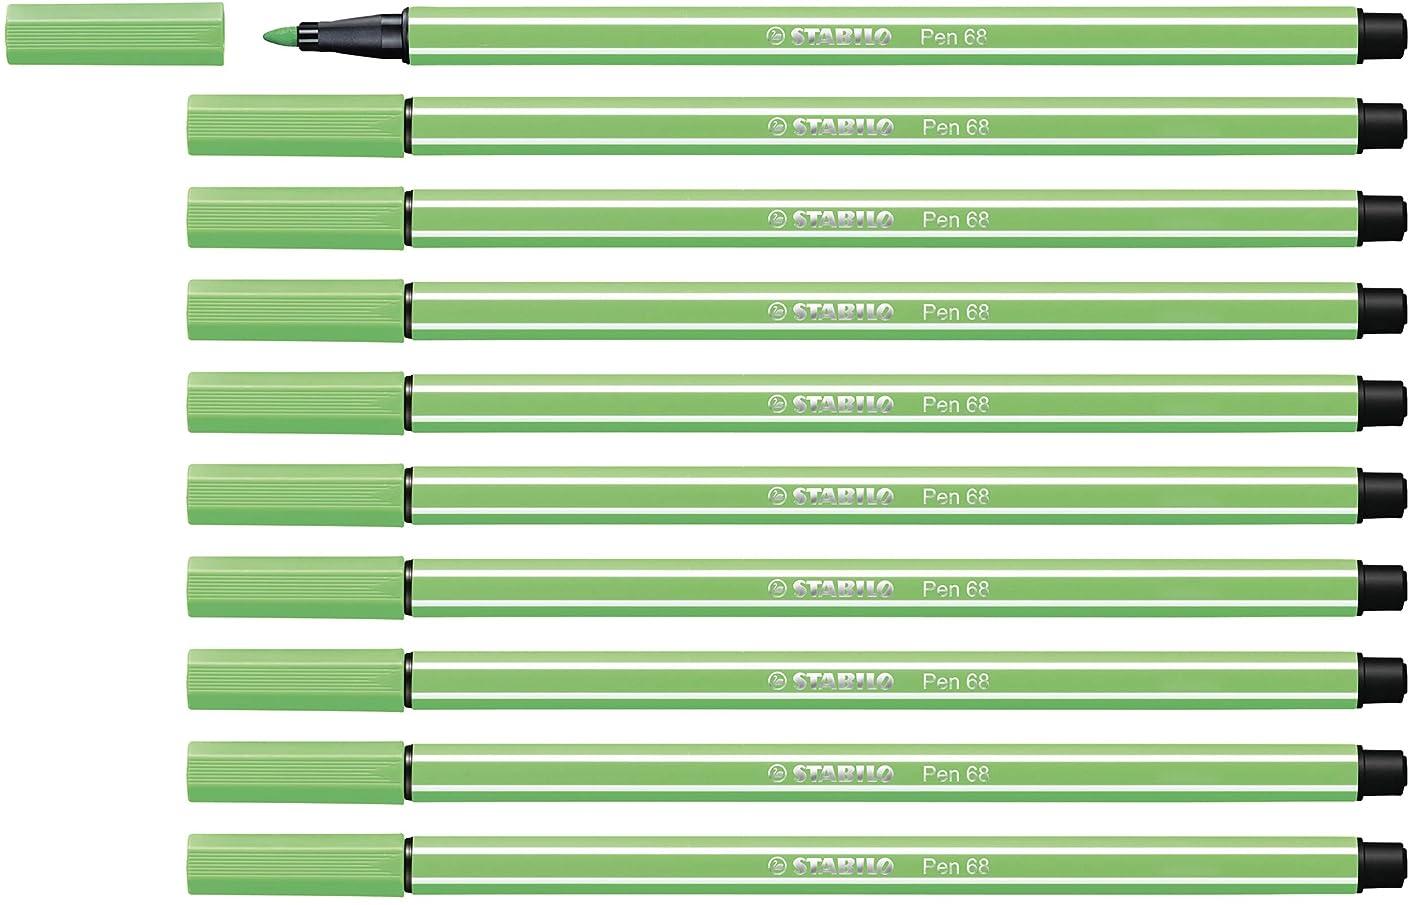 STABILO Pen 68 Light Emerald Pack of 10 - Premium Felt-tip Pen